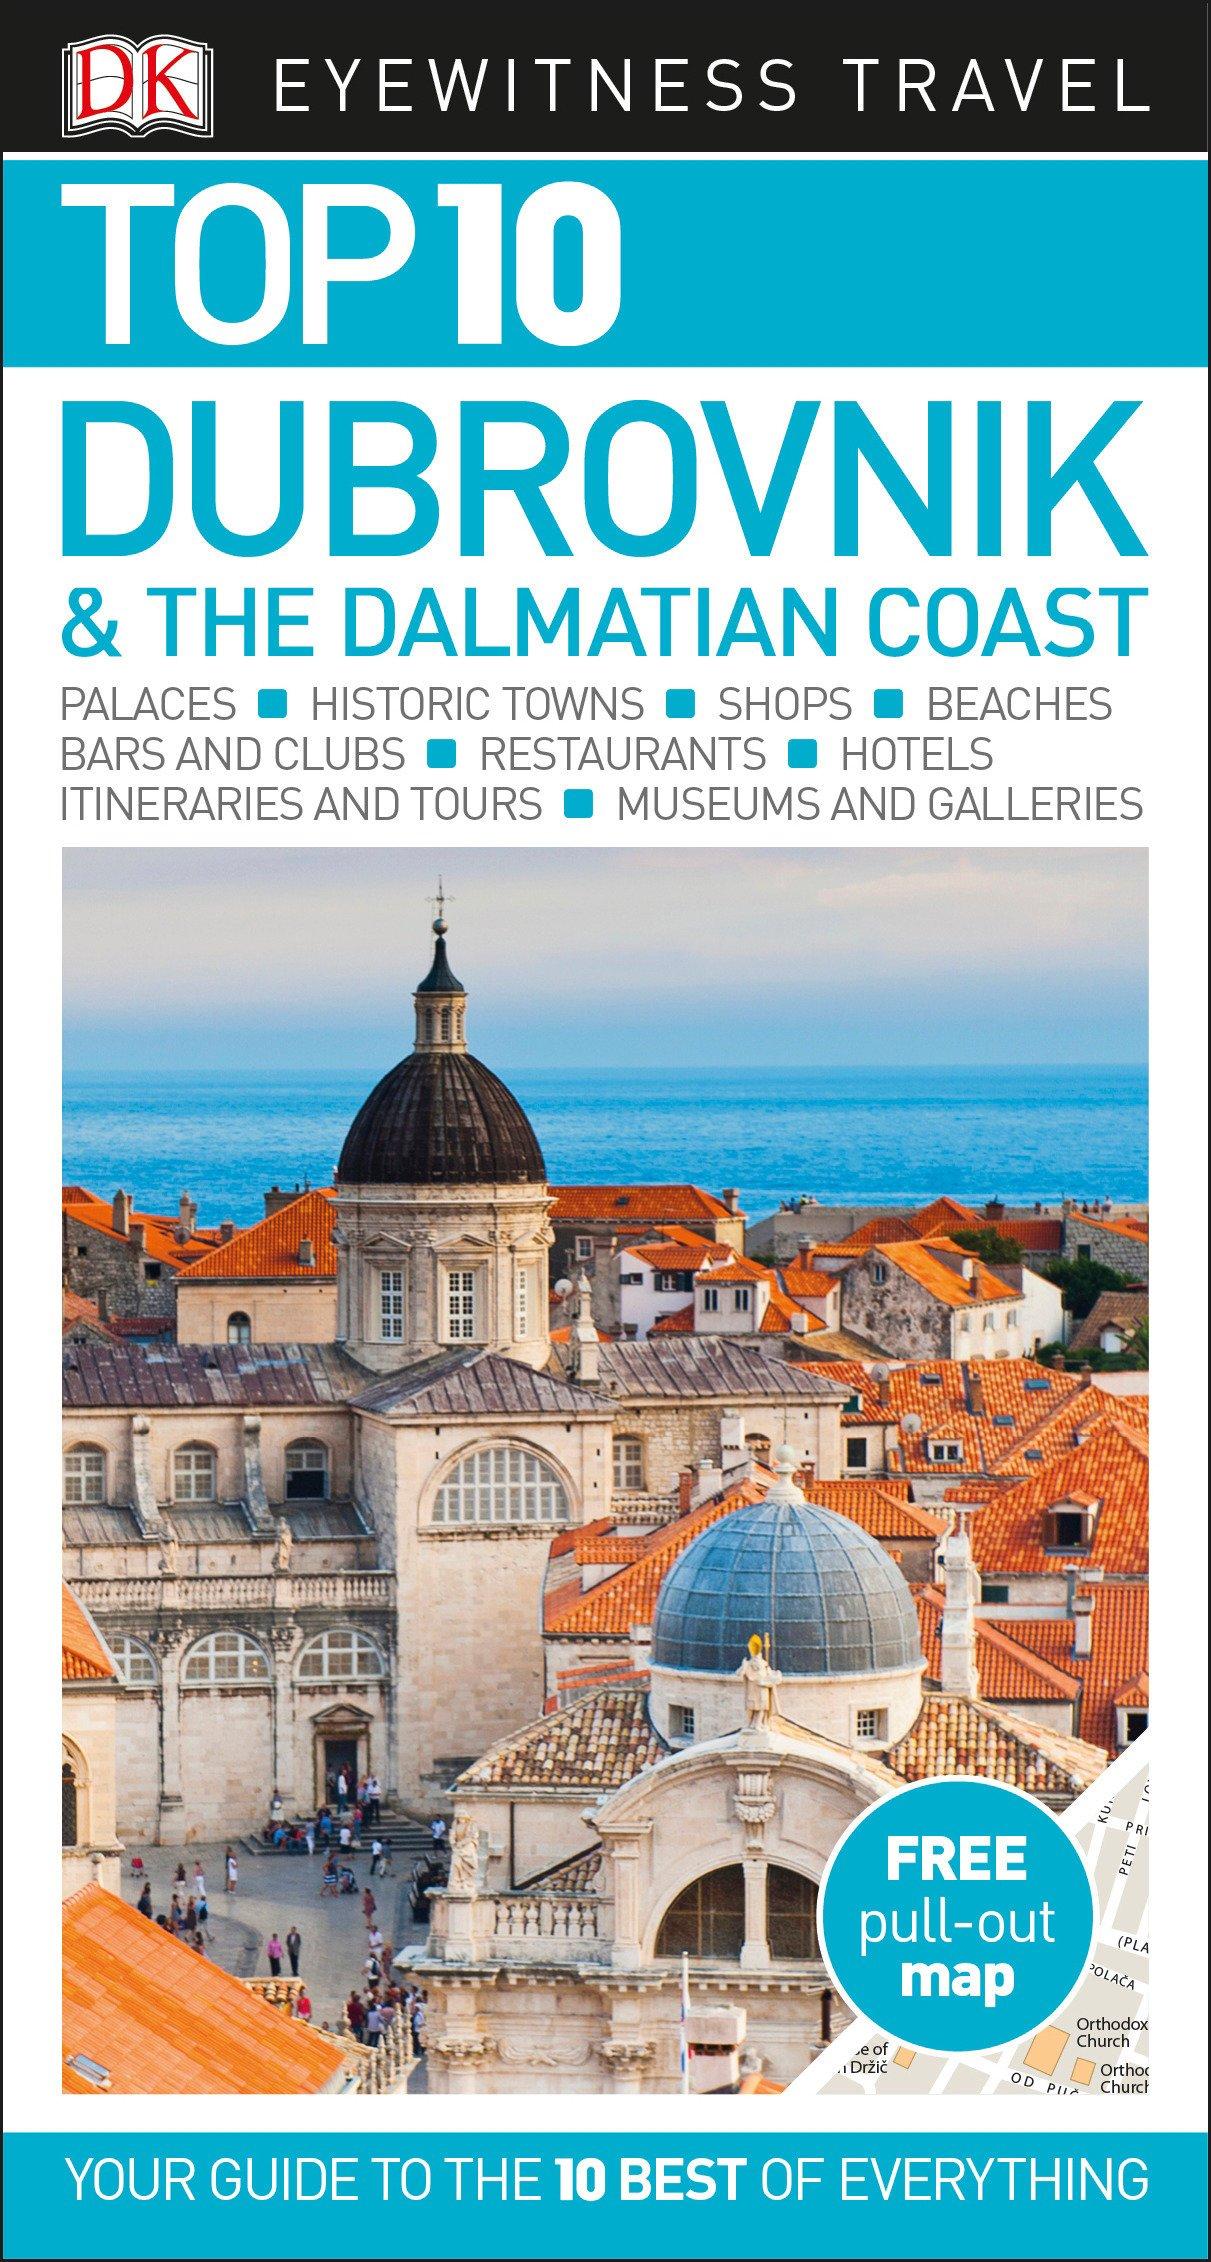 Top 10 Dubrovnik and the Dalmatian Coast (Eyewitness Top 10 Travel Guide)